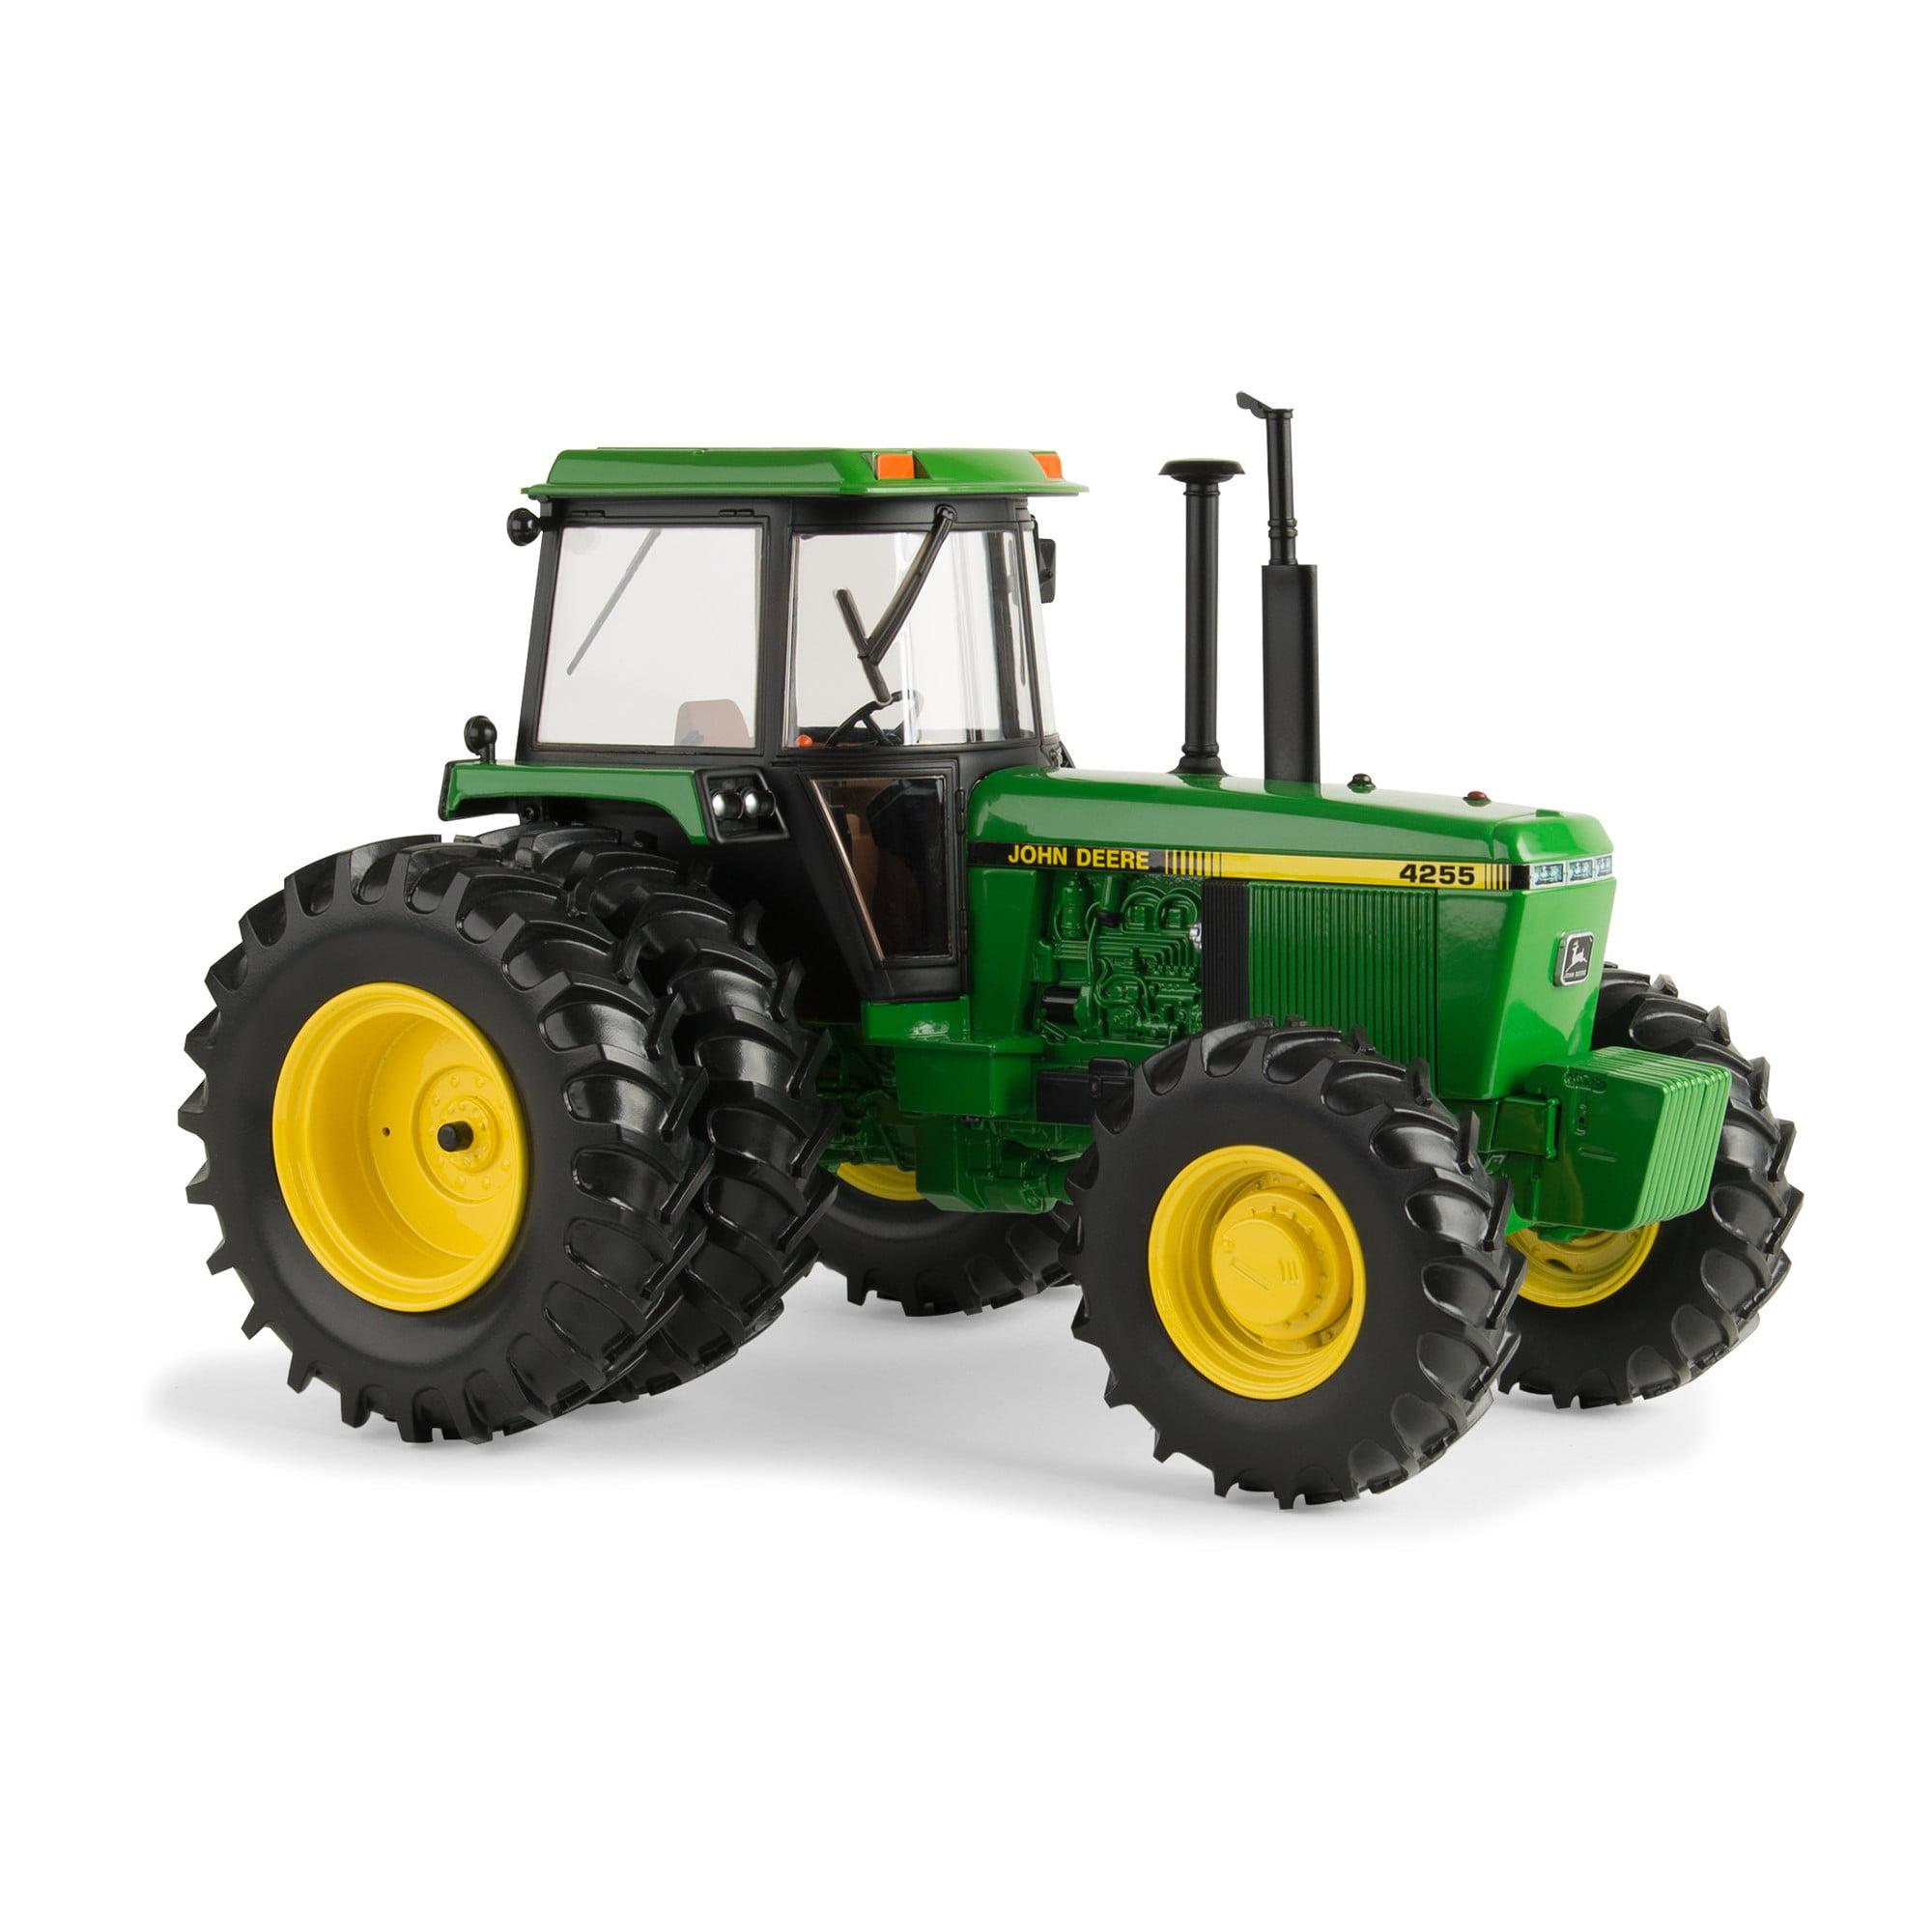 1:16 John Deere 4255 Prestige Tractor by Tomy Inc